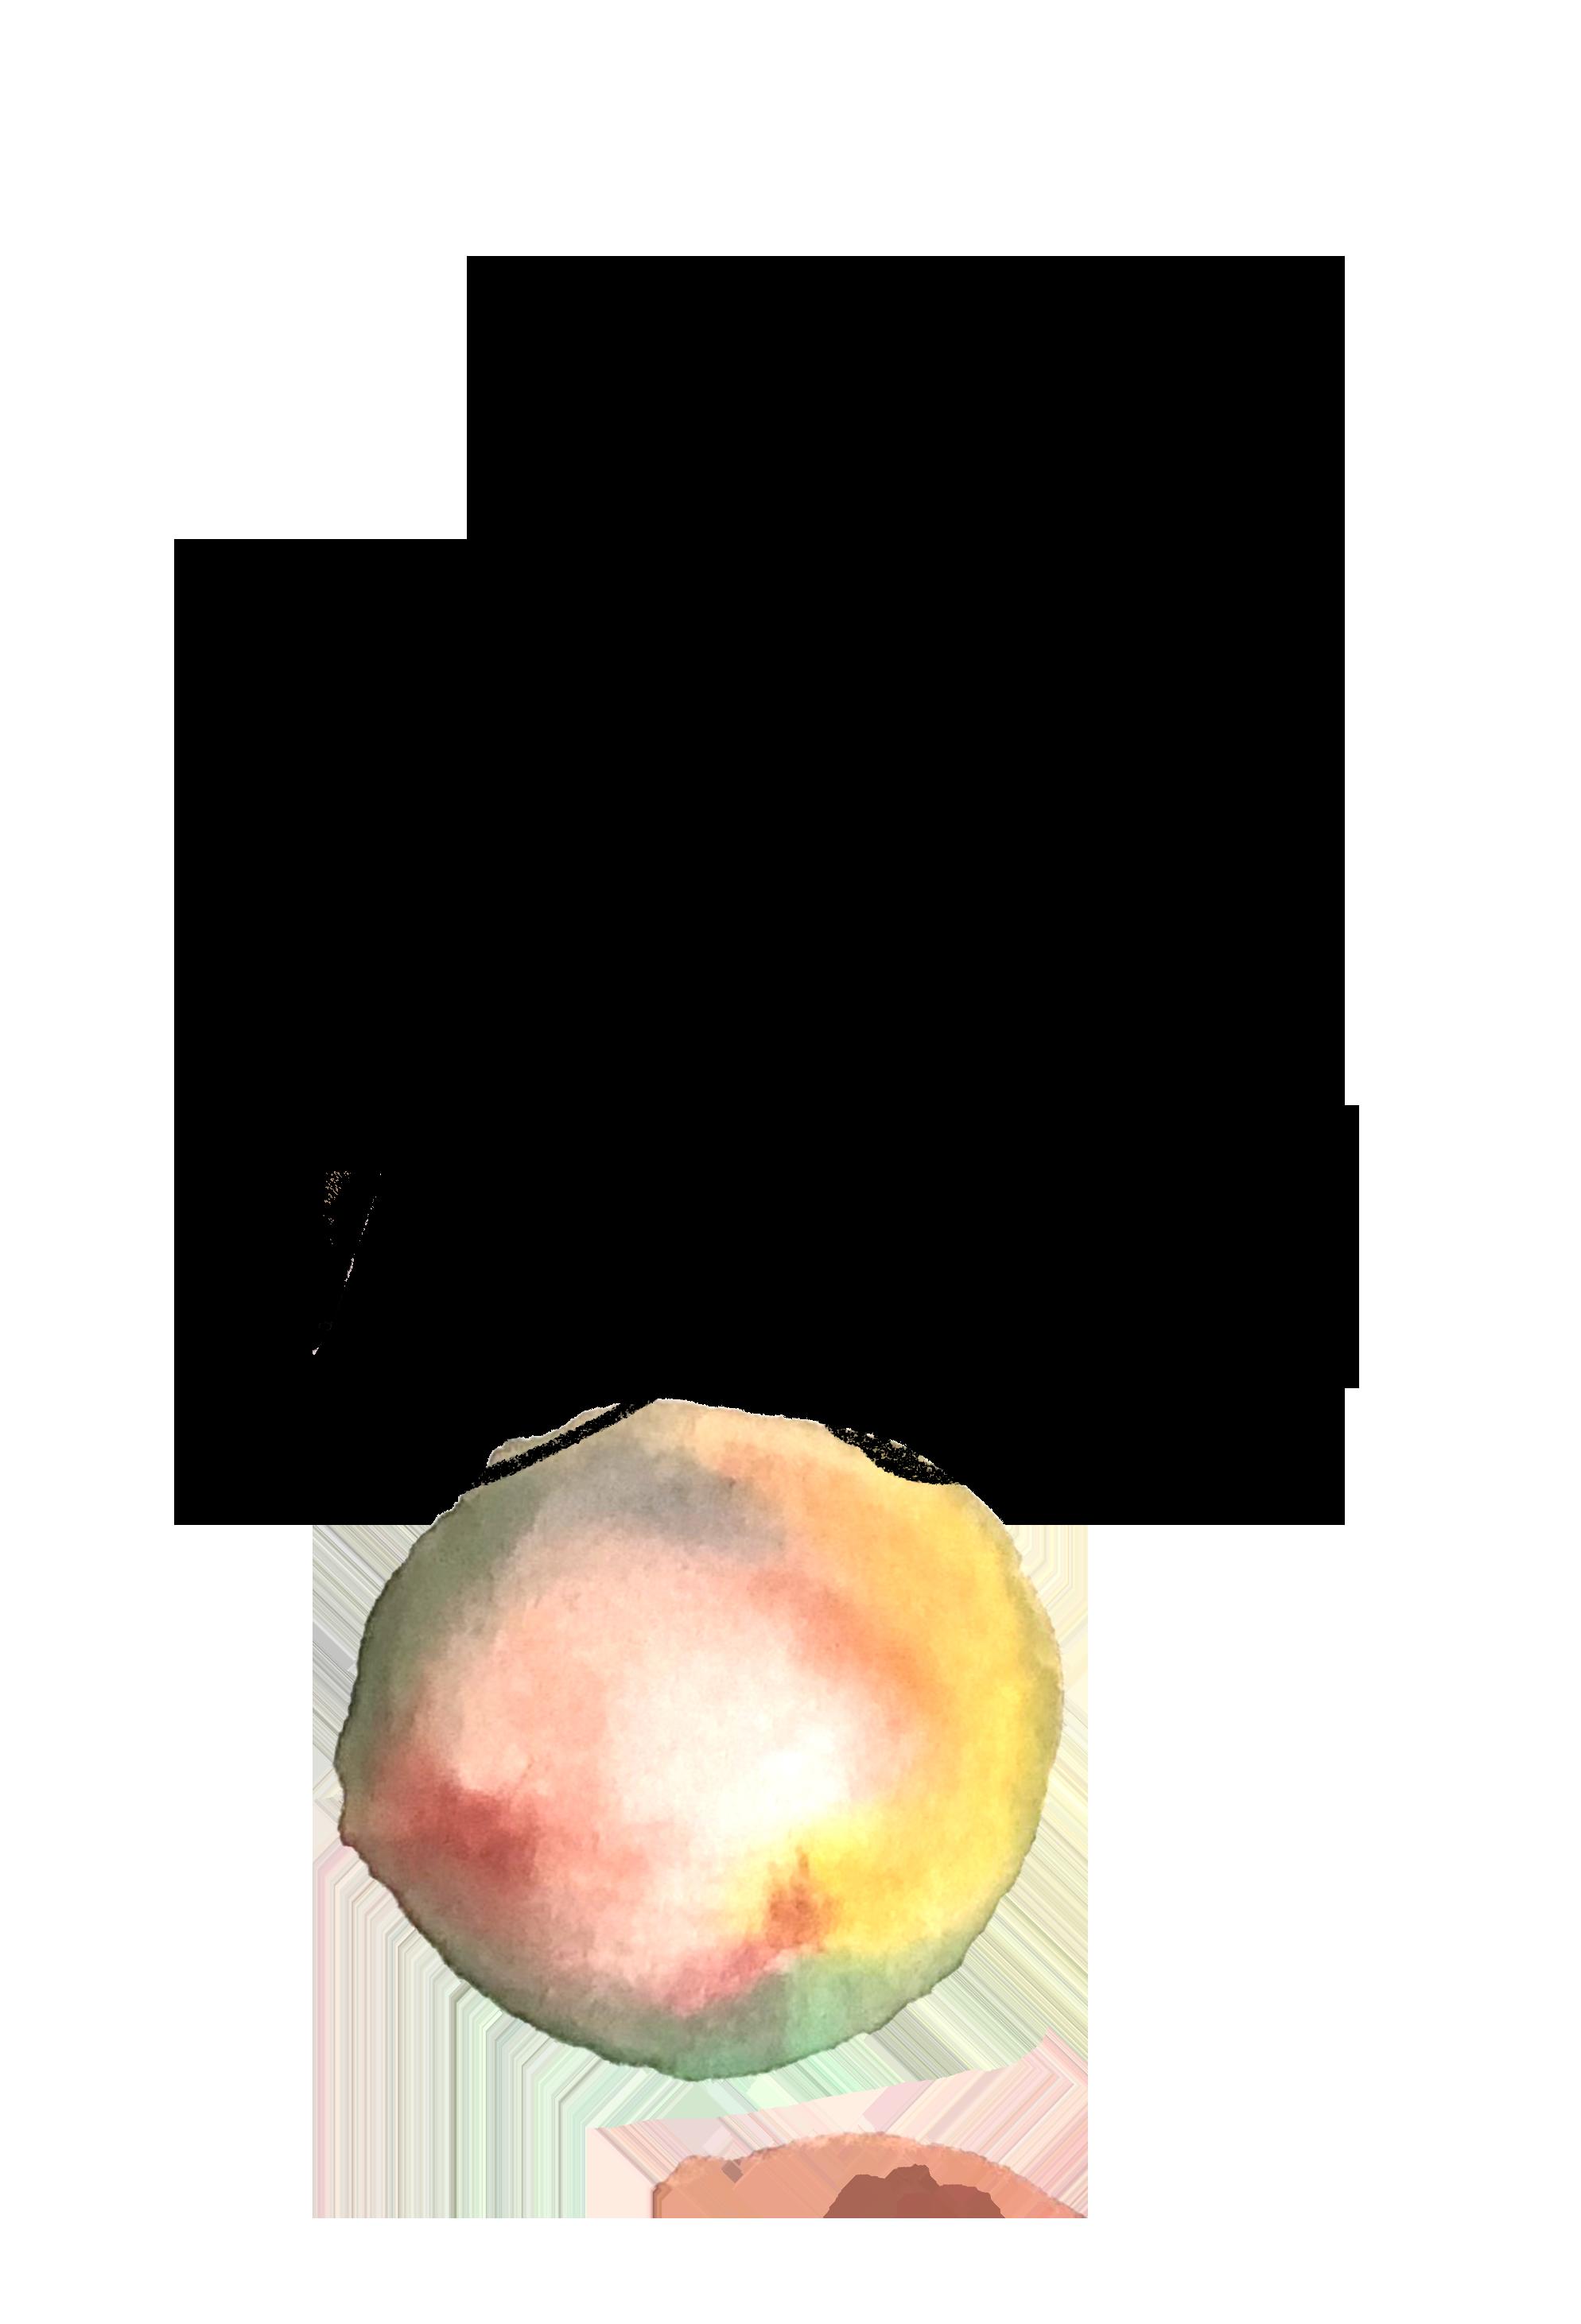 inukshuk-ball2.png